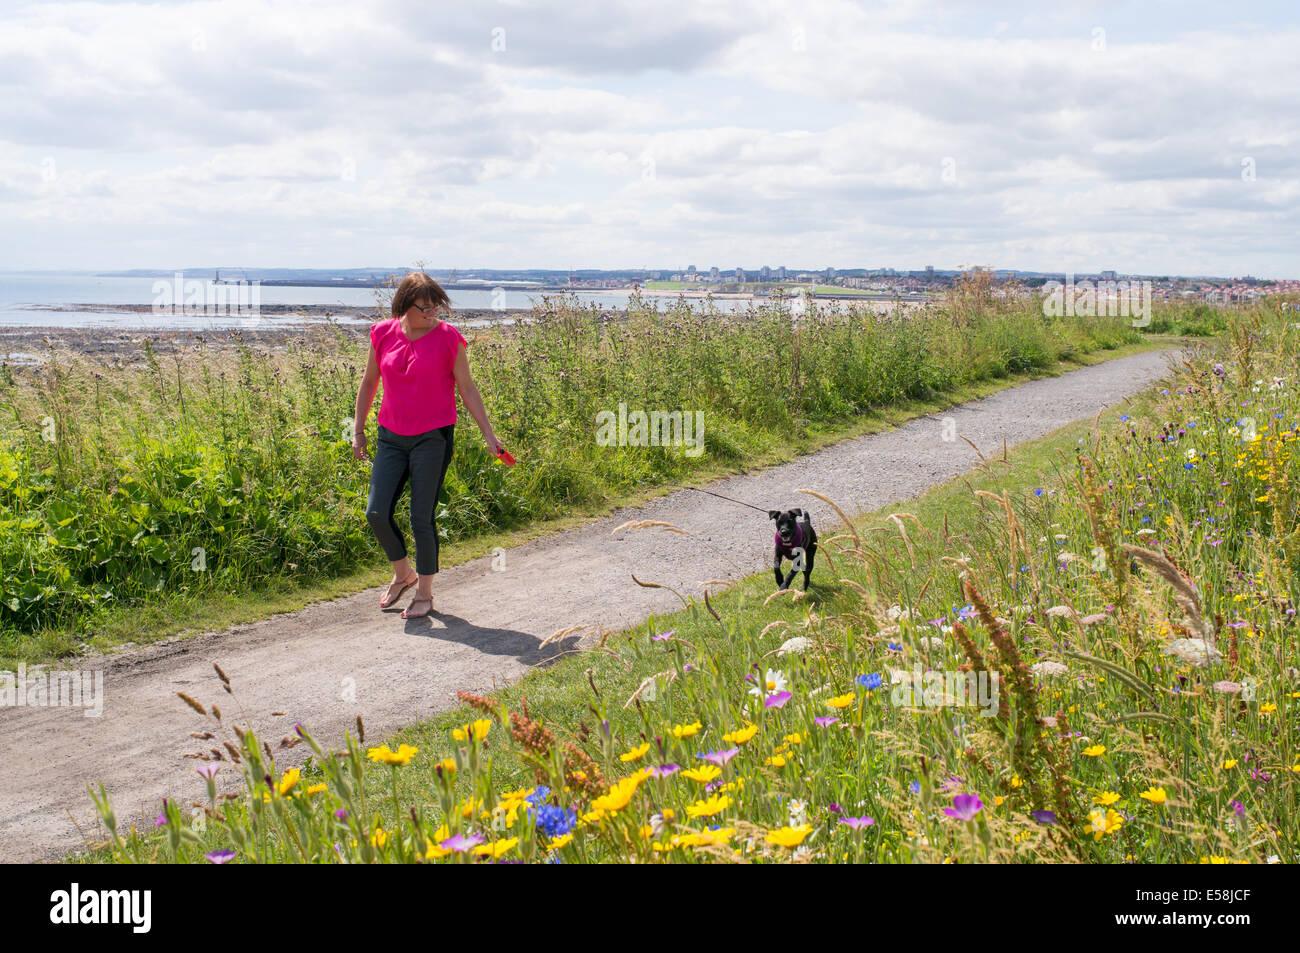 Woman walking dog along the North sea coast path Whitburn north east England, UK Stock Photo